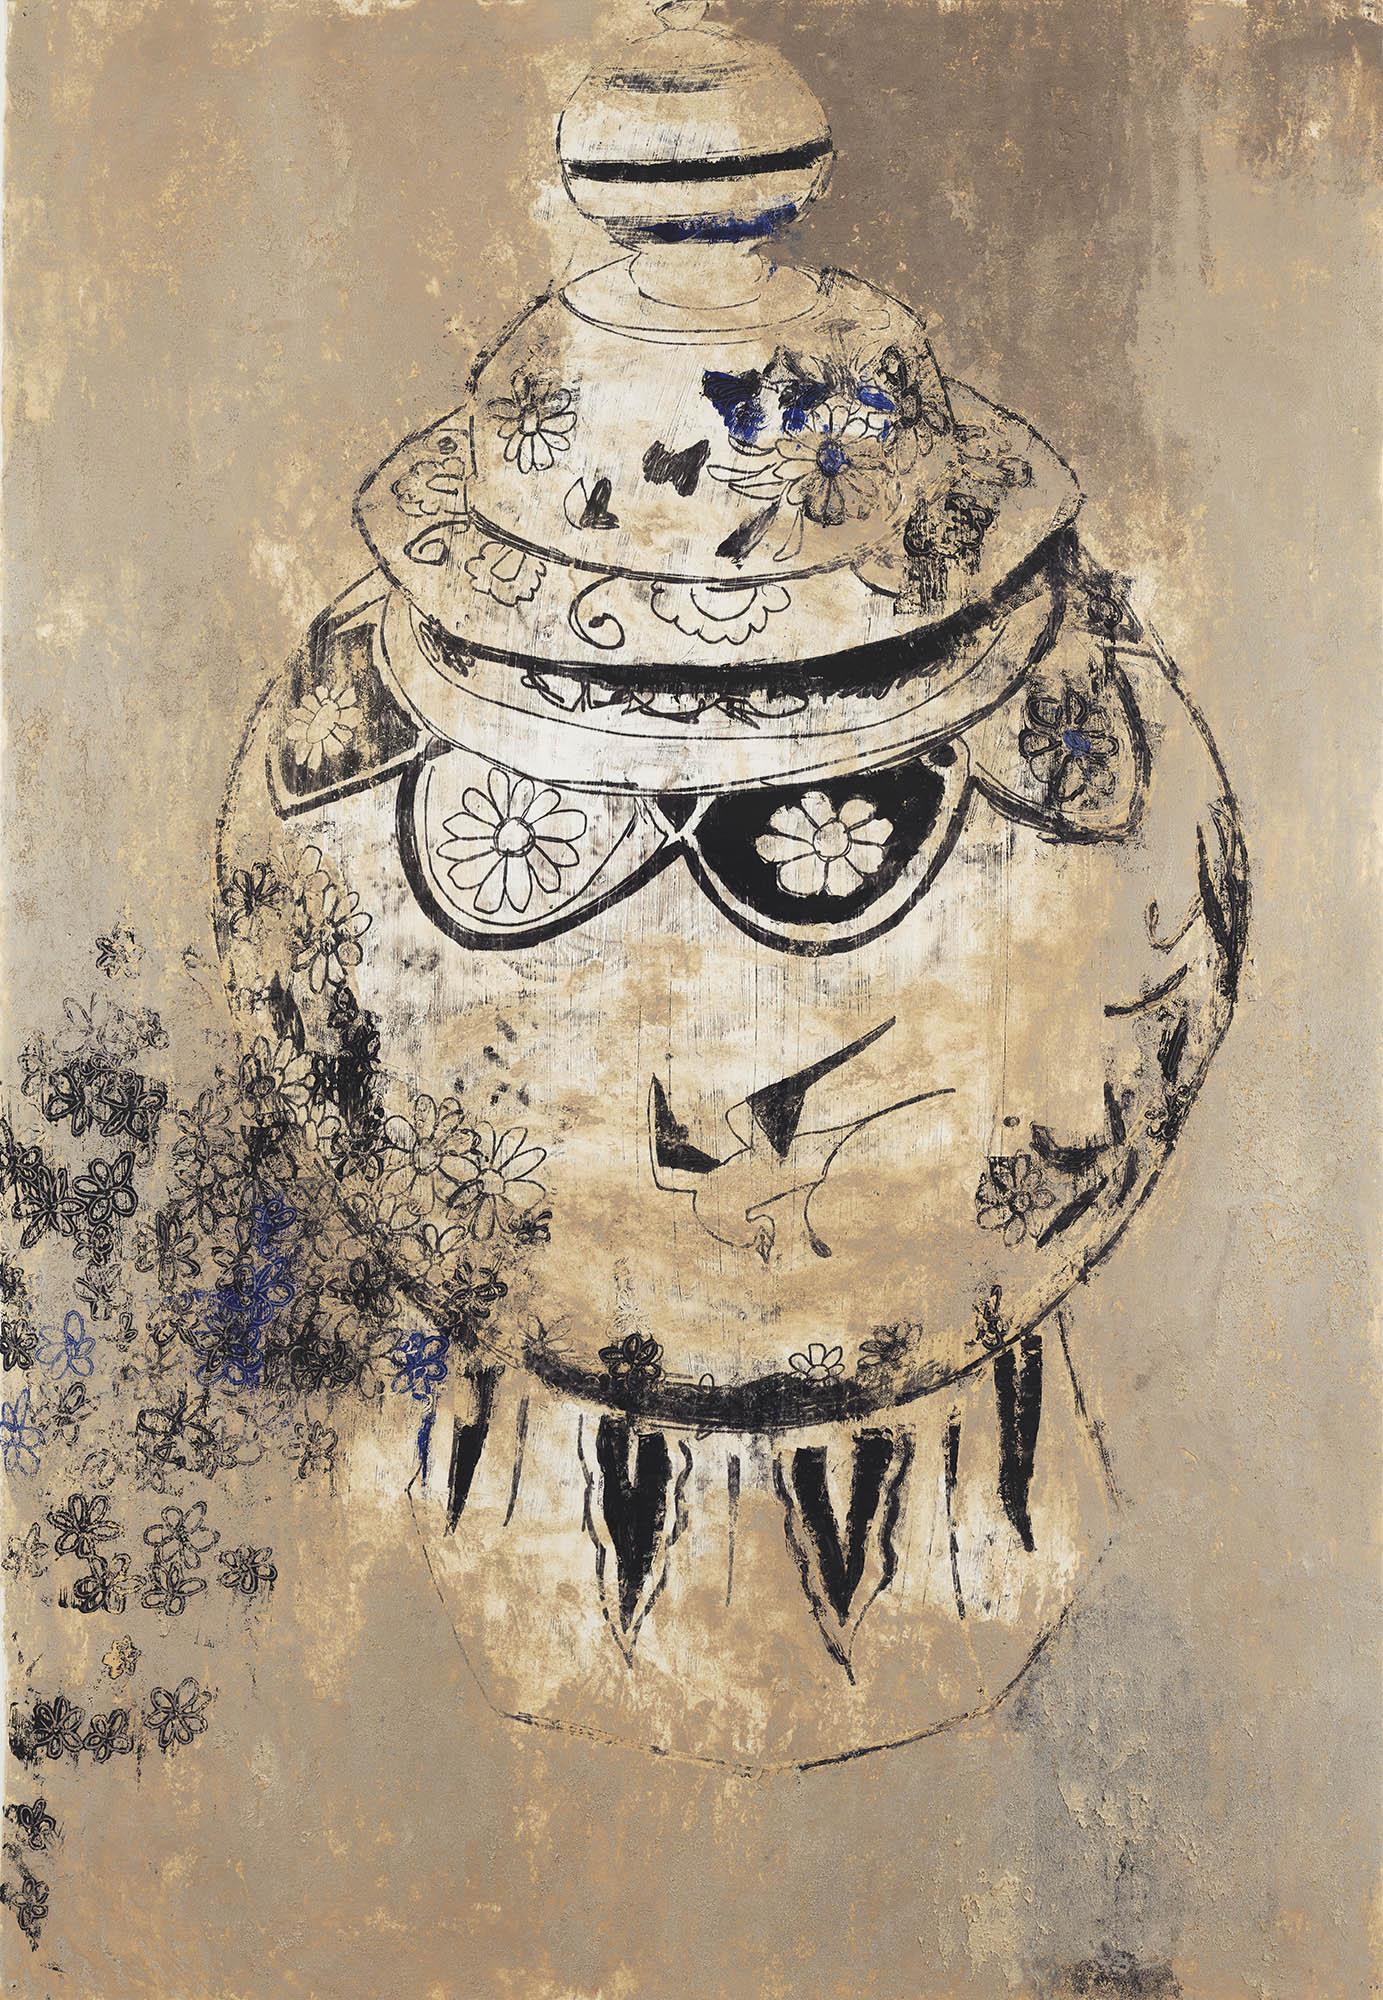 Image of Enoc Perez, Peter's Vase, 2007